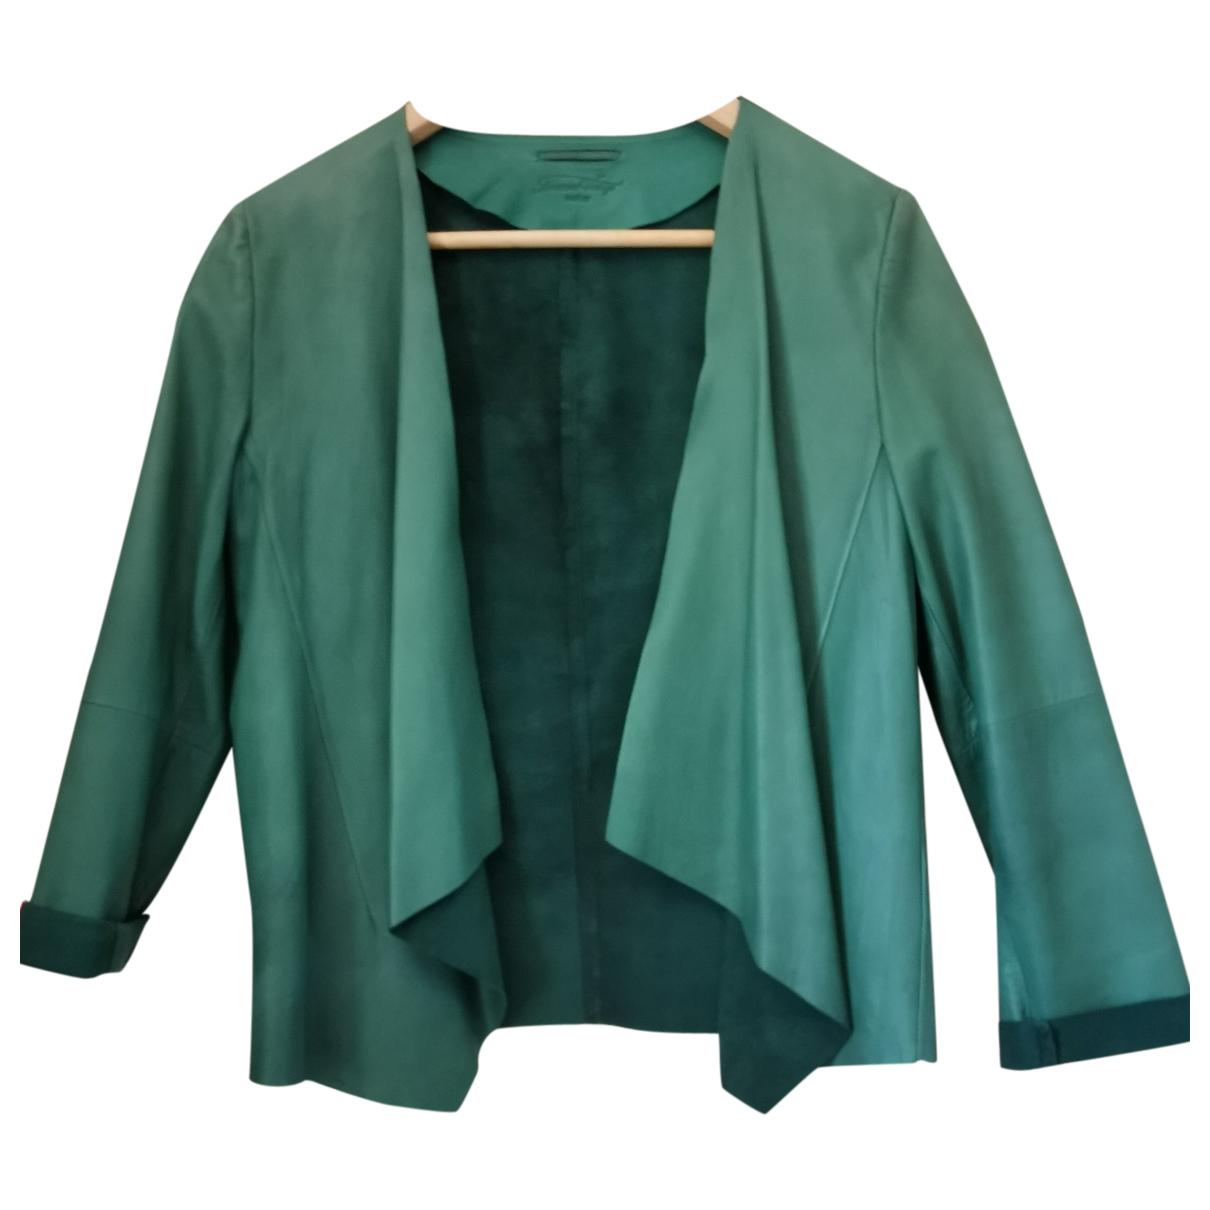 American Vintage - Veste   pour femme en cuir - vert